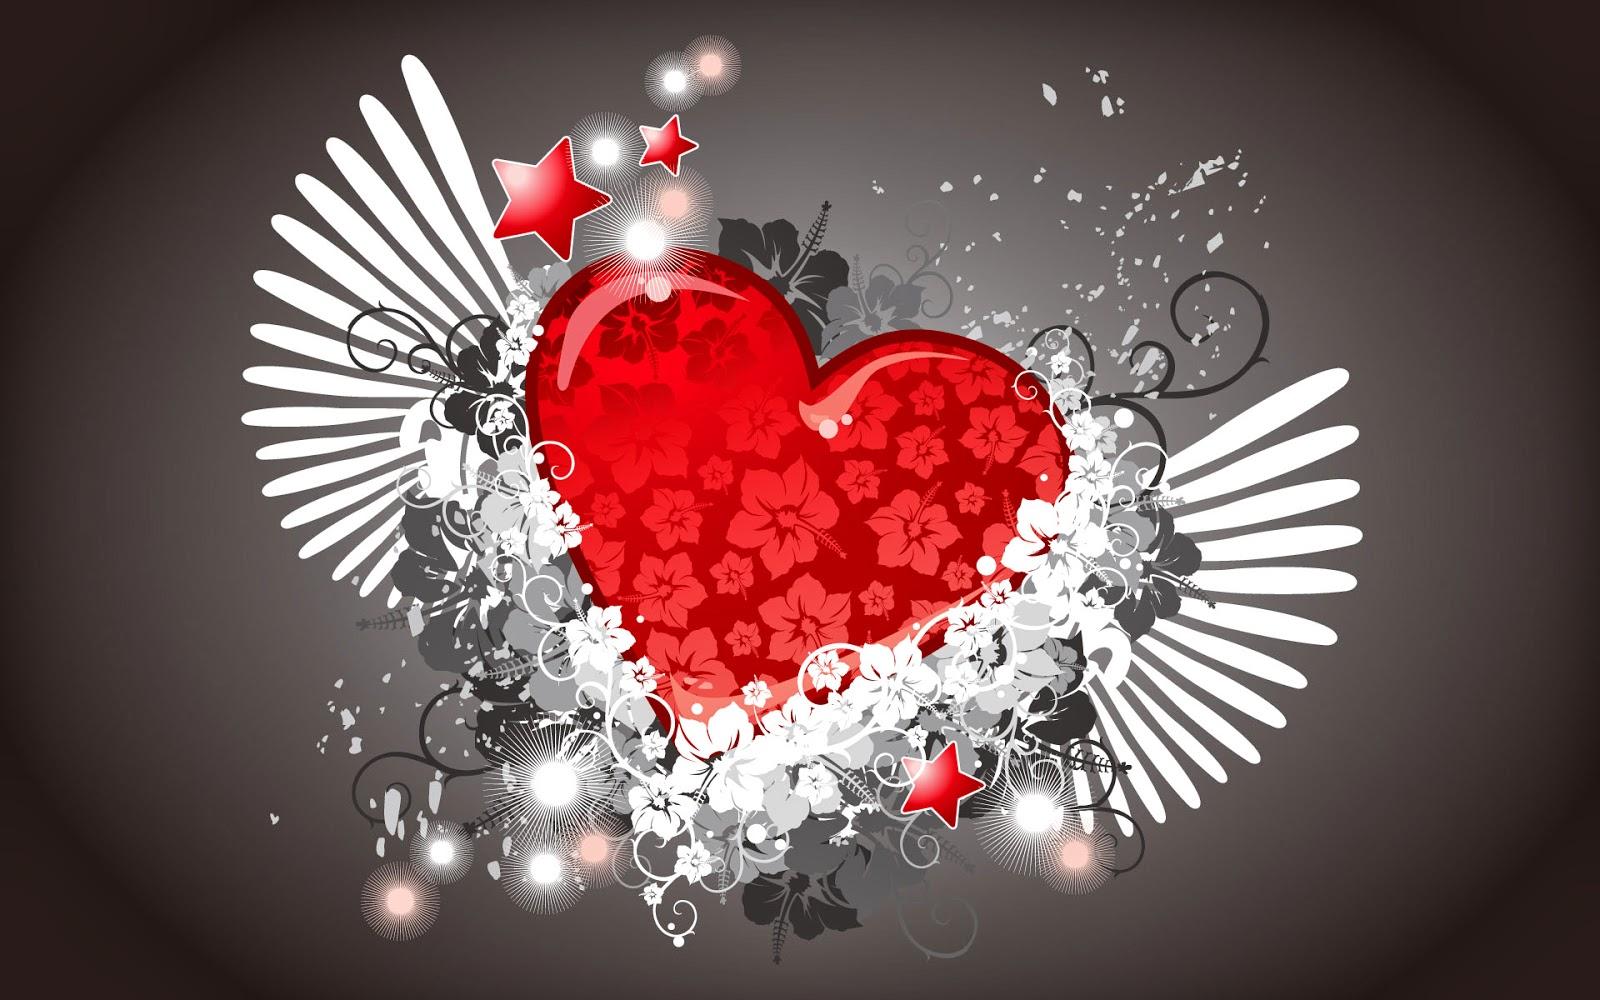 Imagenes y fondos de pantalla para san valentin taringa - San valentin desktop backgrounds ...